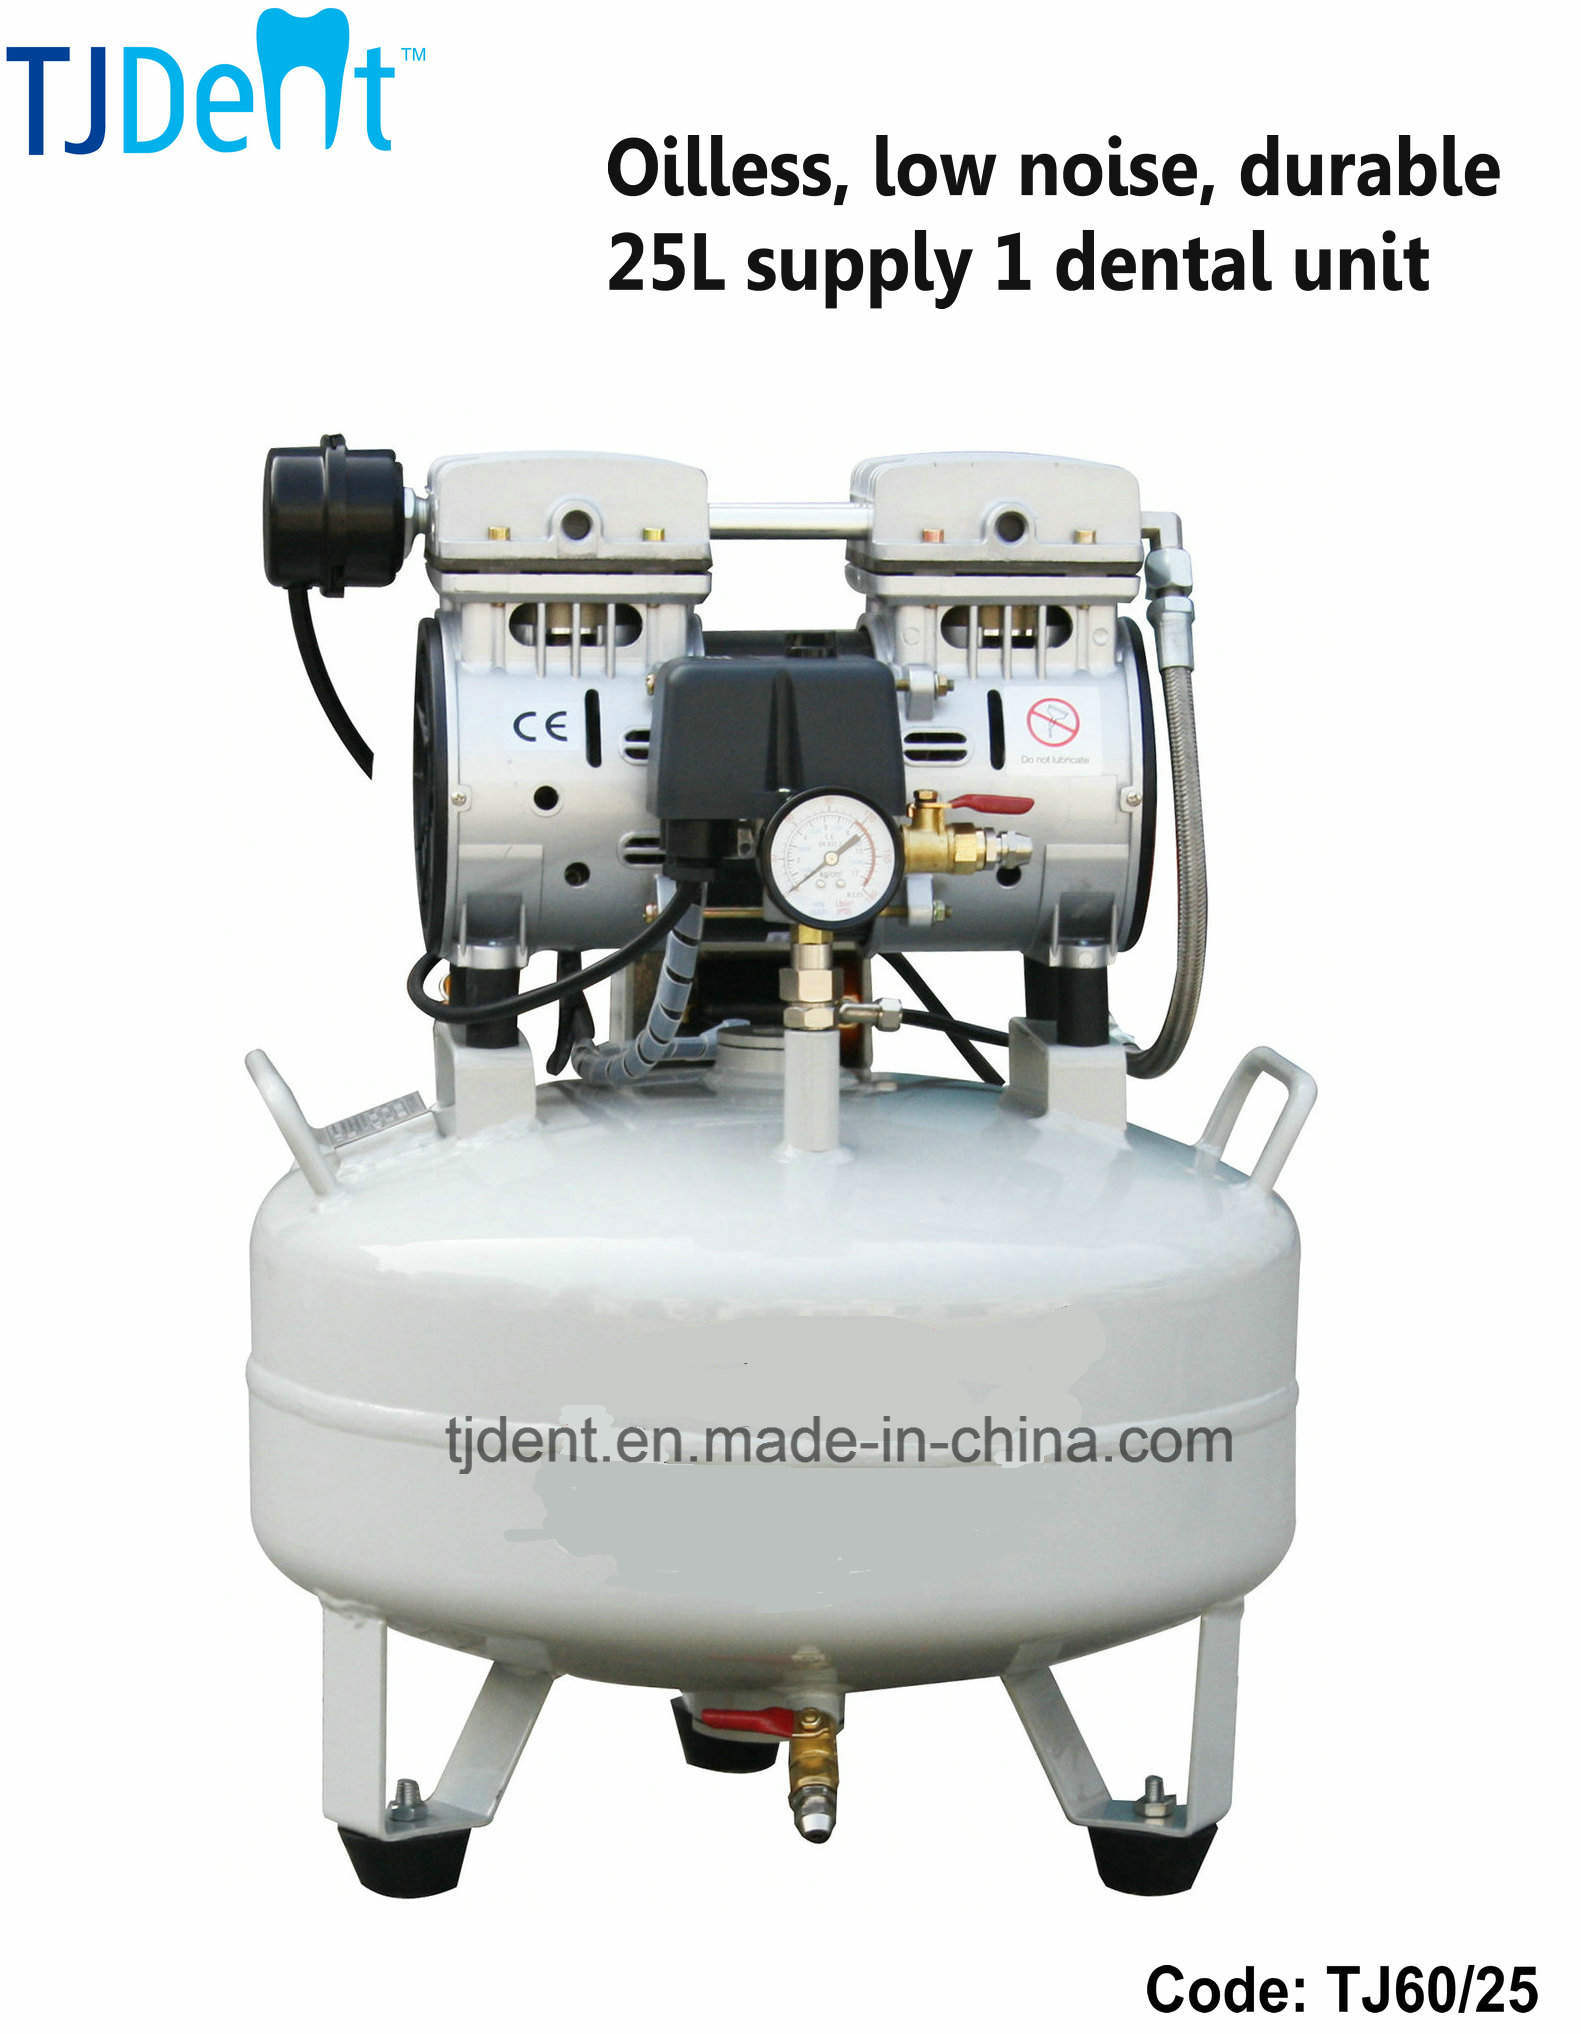 Oilless & Noiseless 25L Dental Air Compressor (TJ60/25)